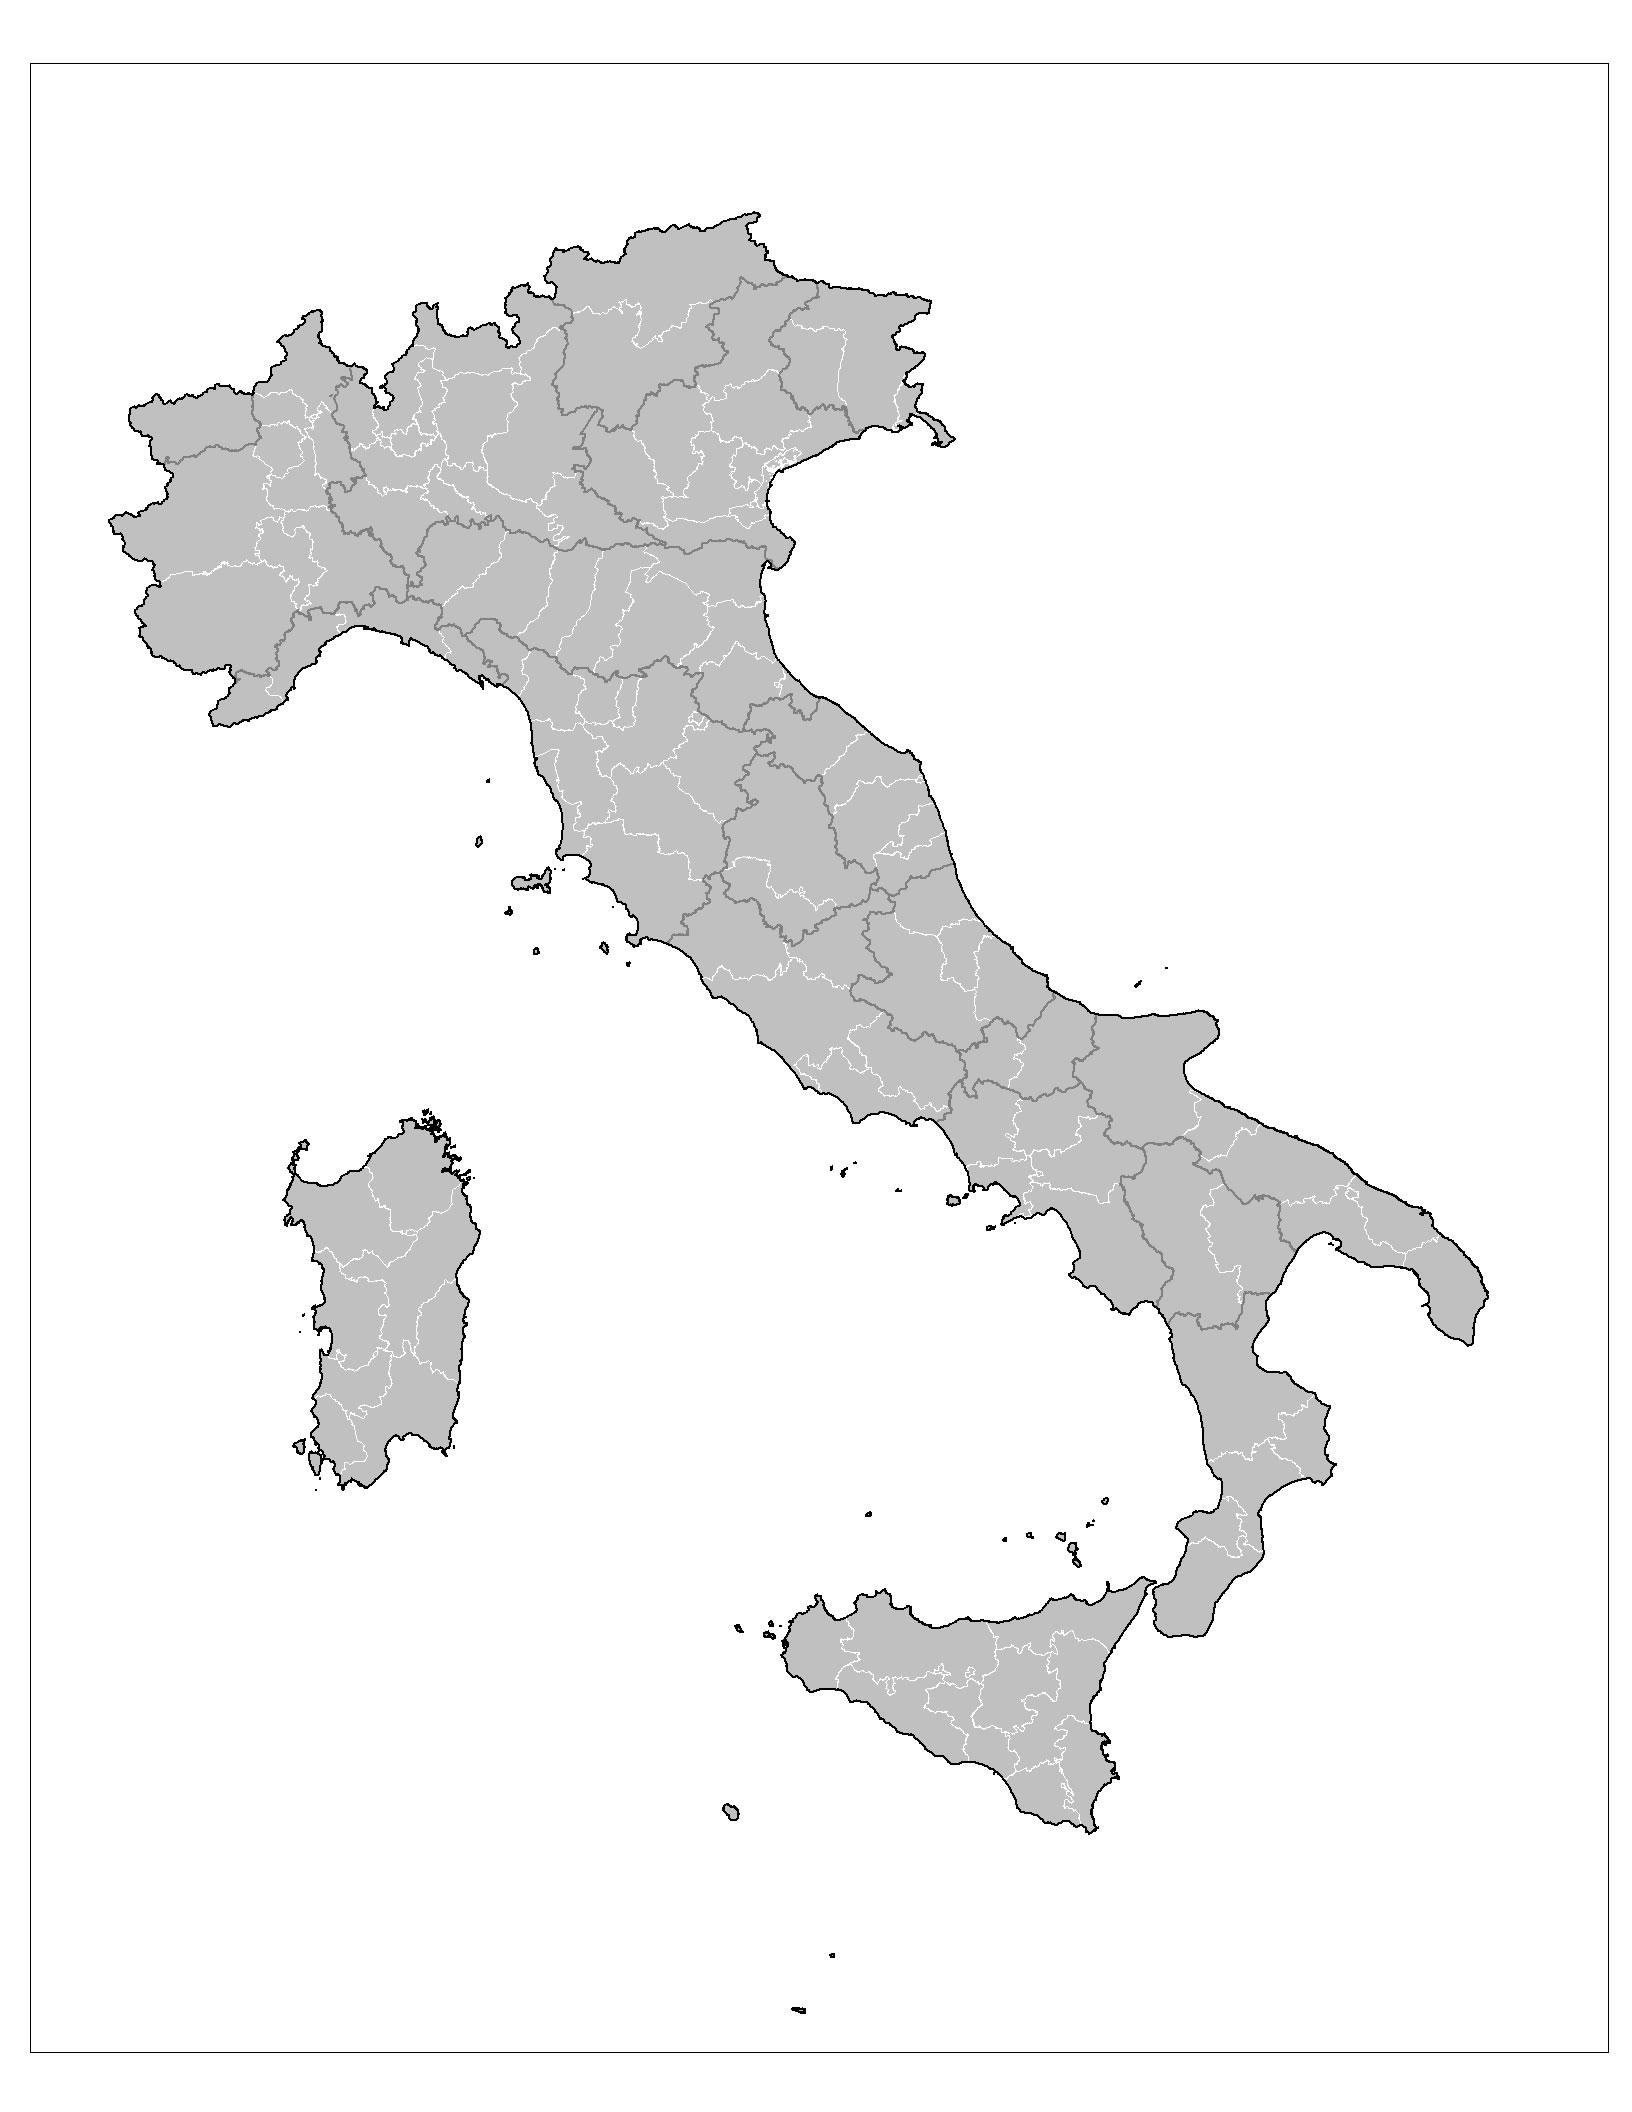 Carte Italie Vierge Numéros Régions, Carte Vierge Des destiné Carte Des Régions Vierge